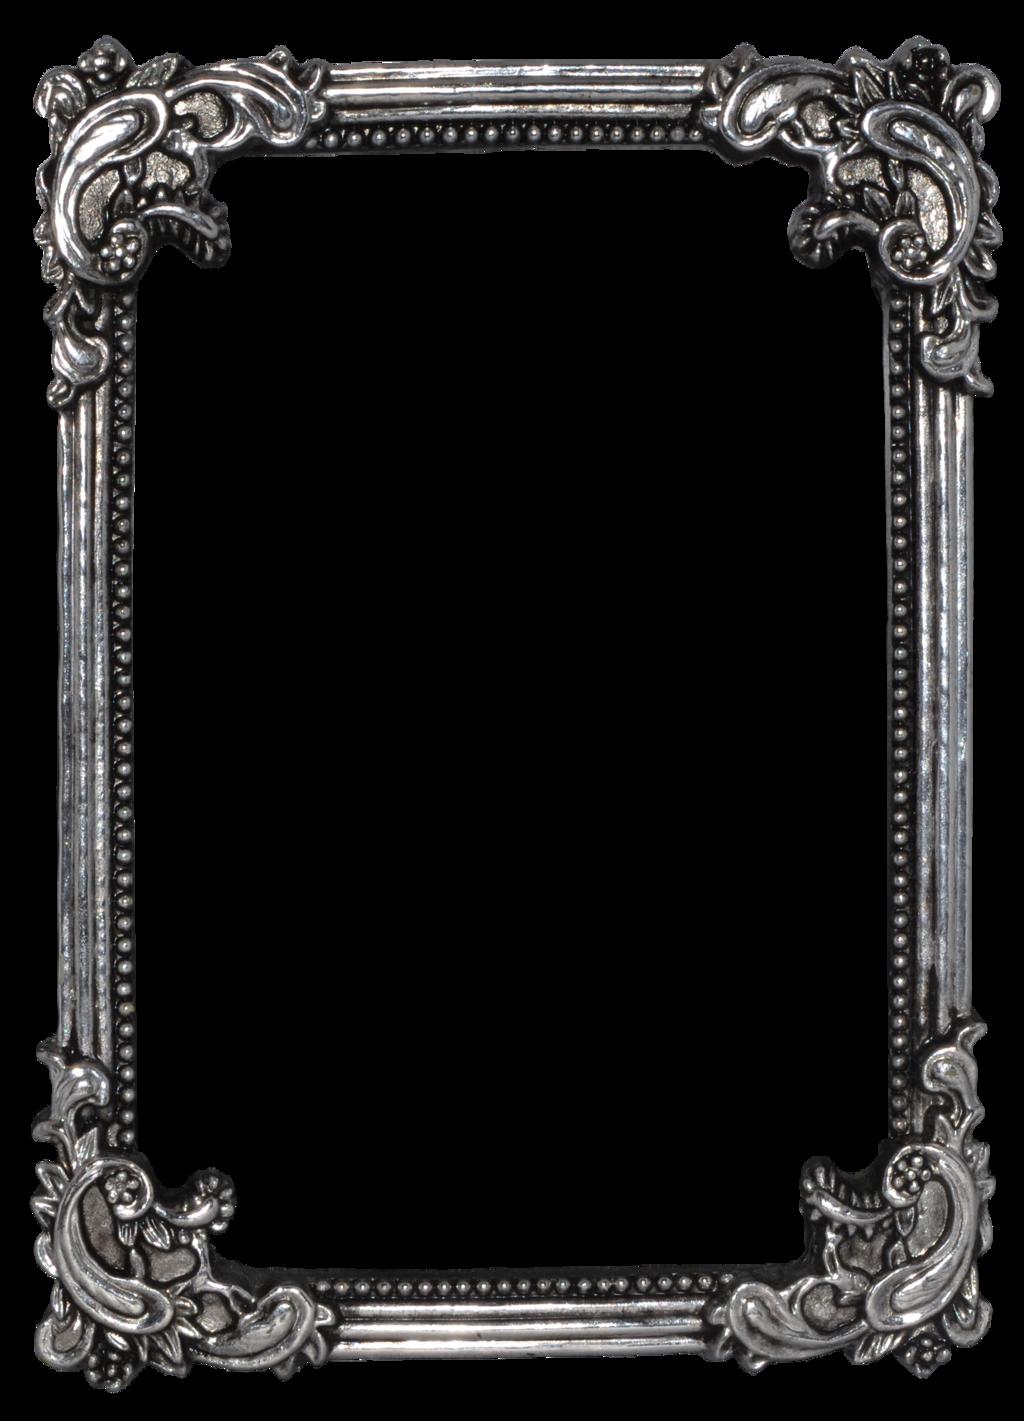 download vintage frame png hq png image freepngimg Microsoft Free Clip Art Downloads Dragon Clip Art Free Download